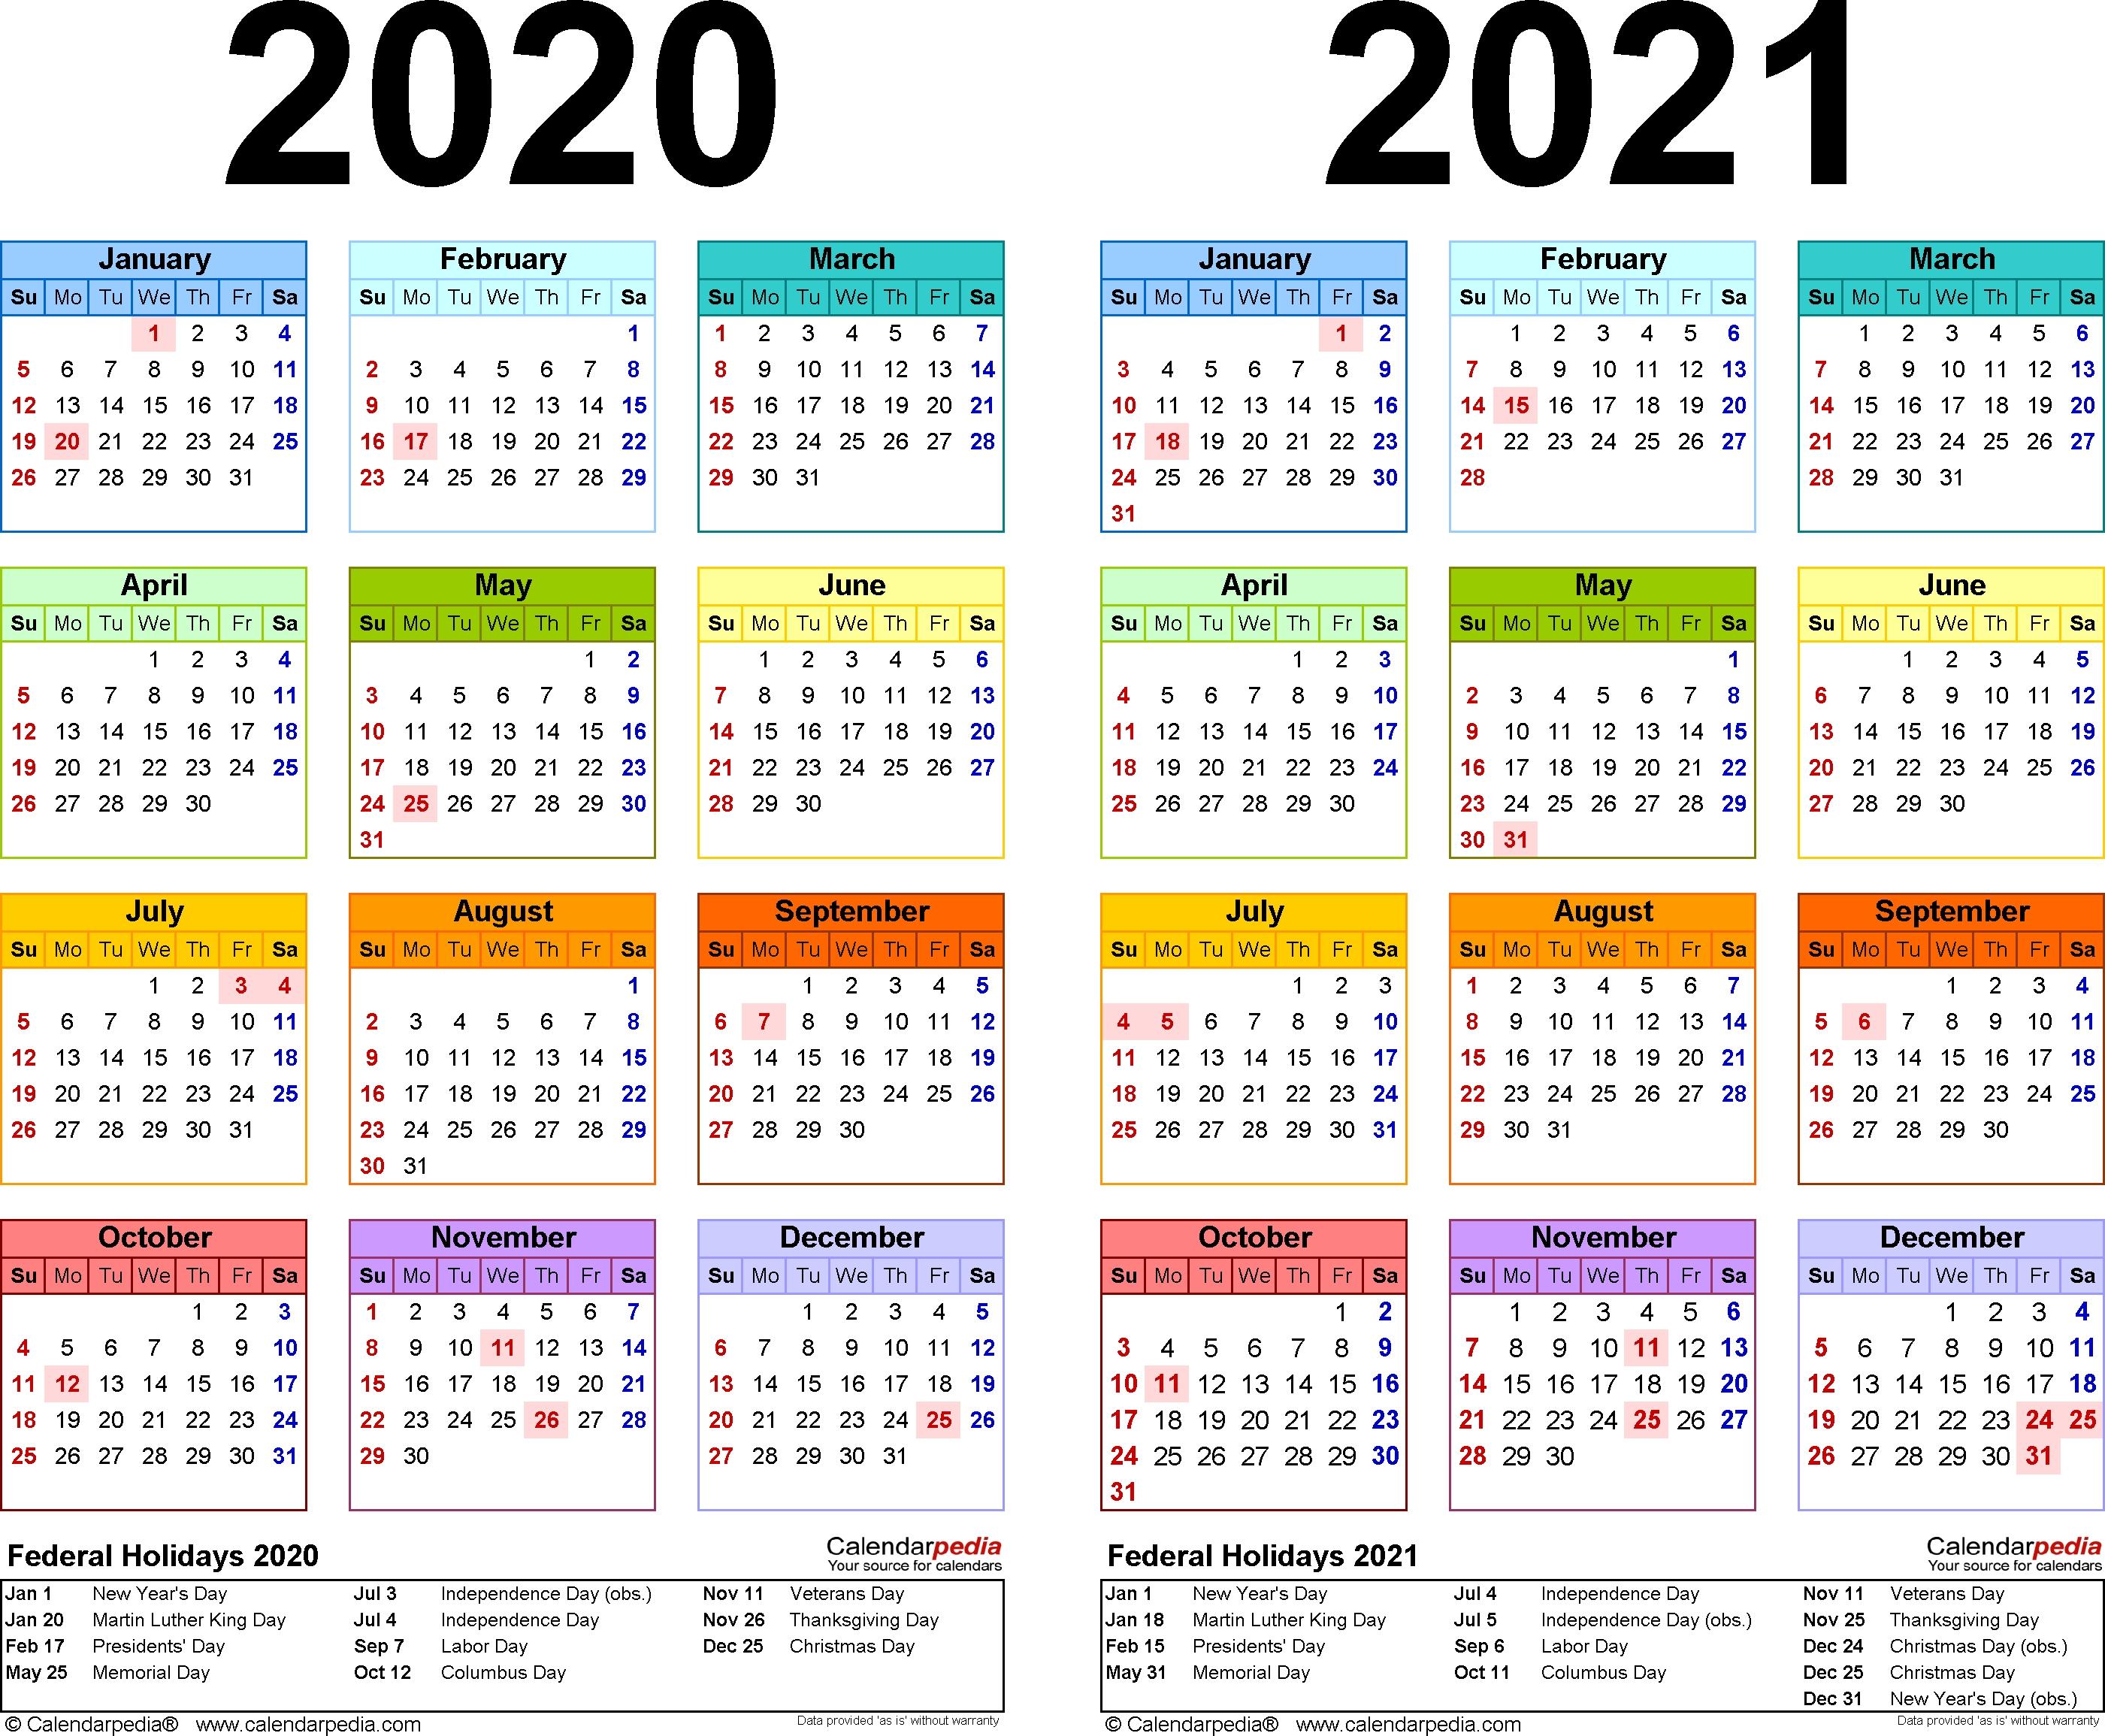 Exceptional 2020 And 2021 Calendar Printable • Printable Blank